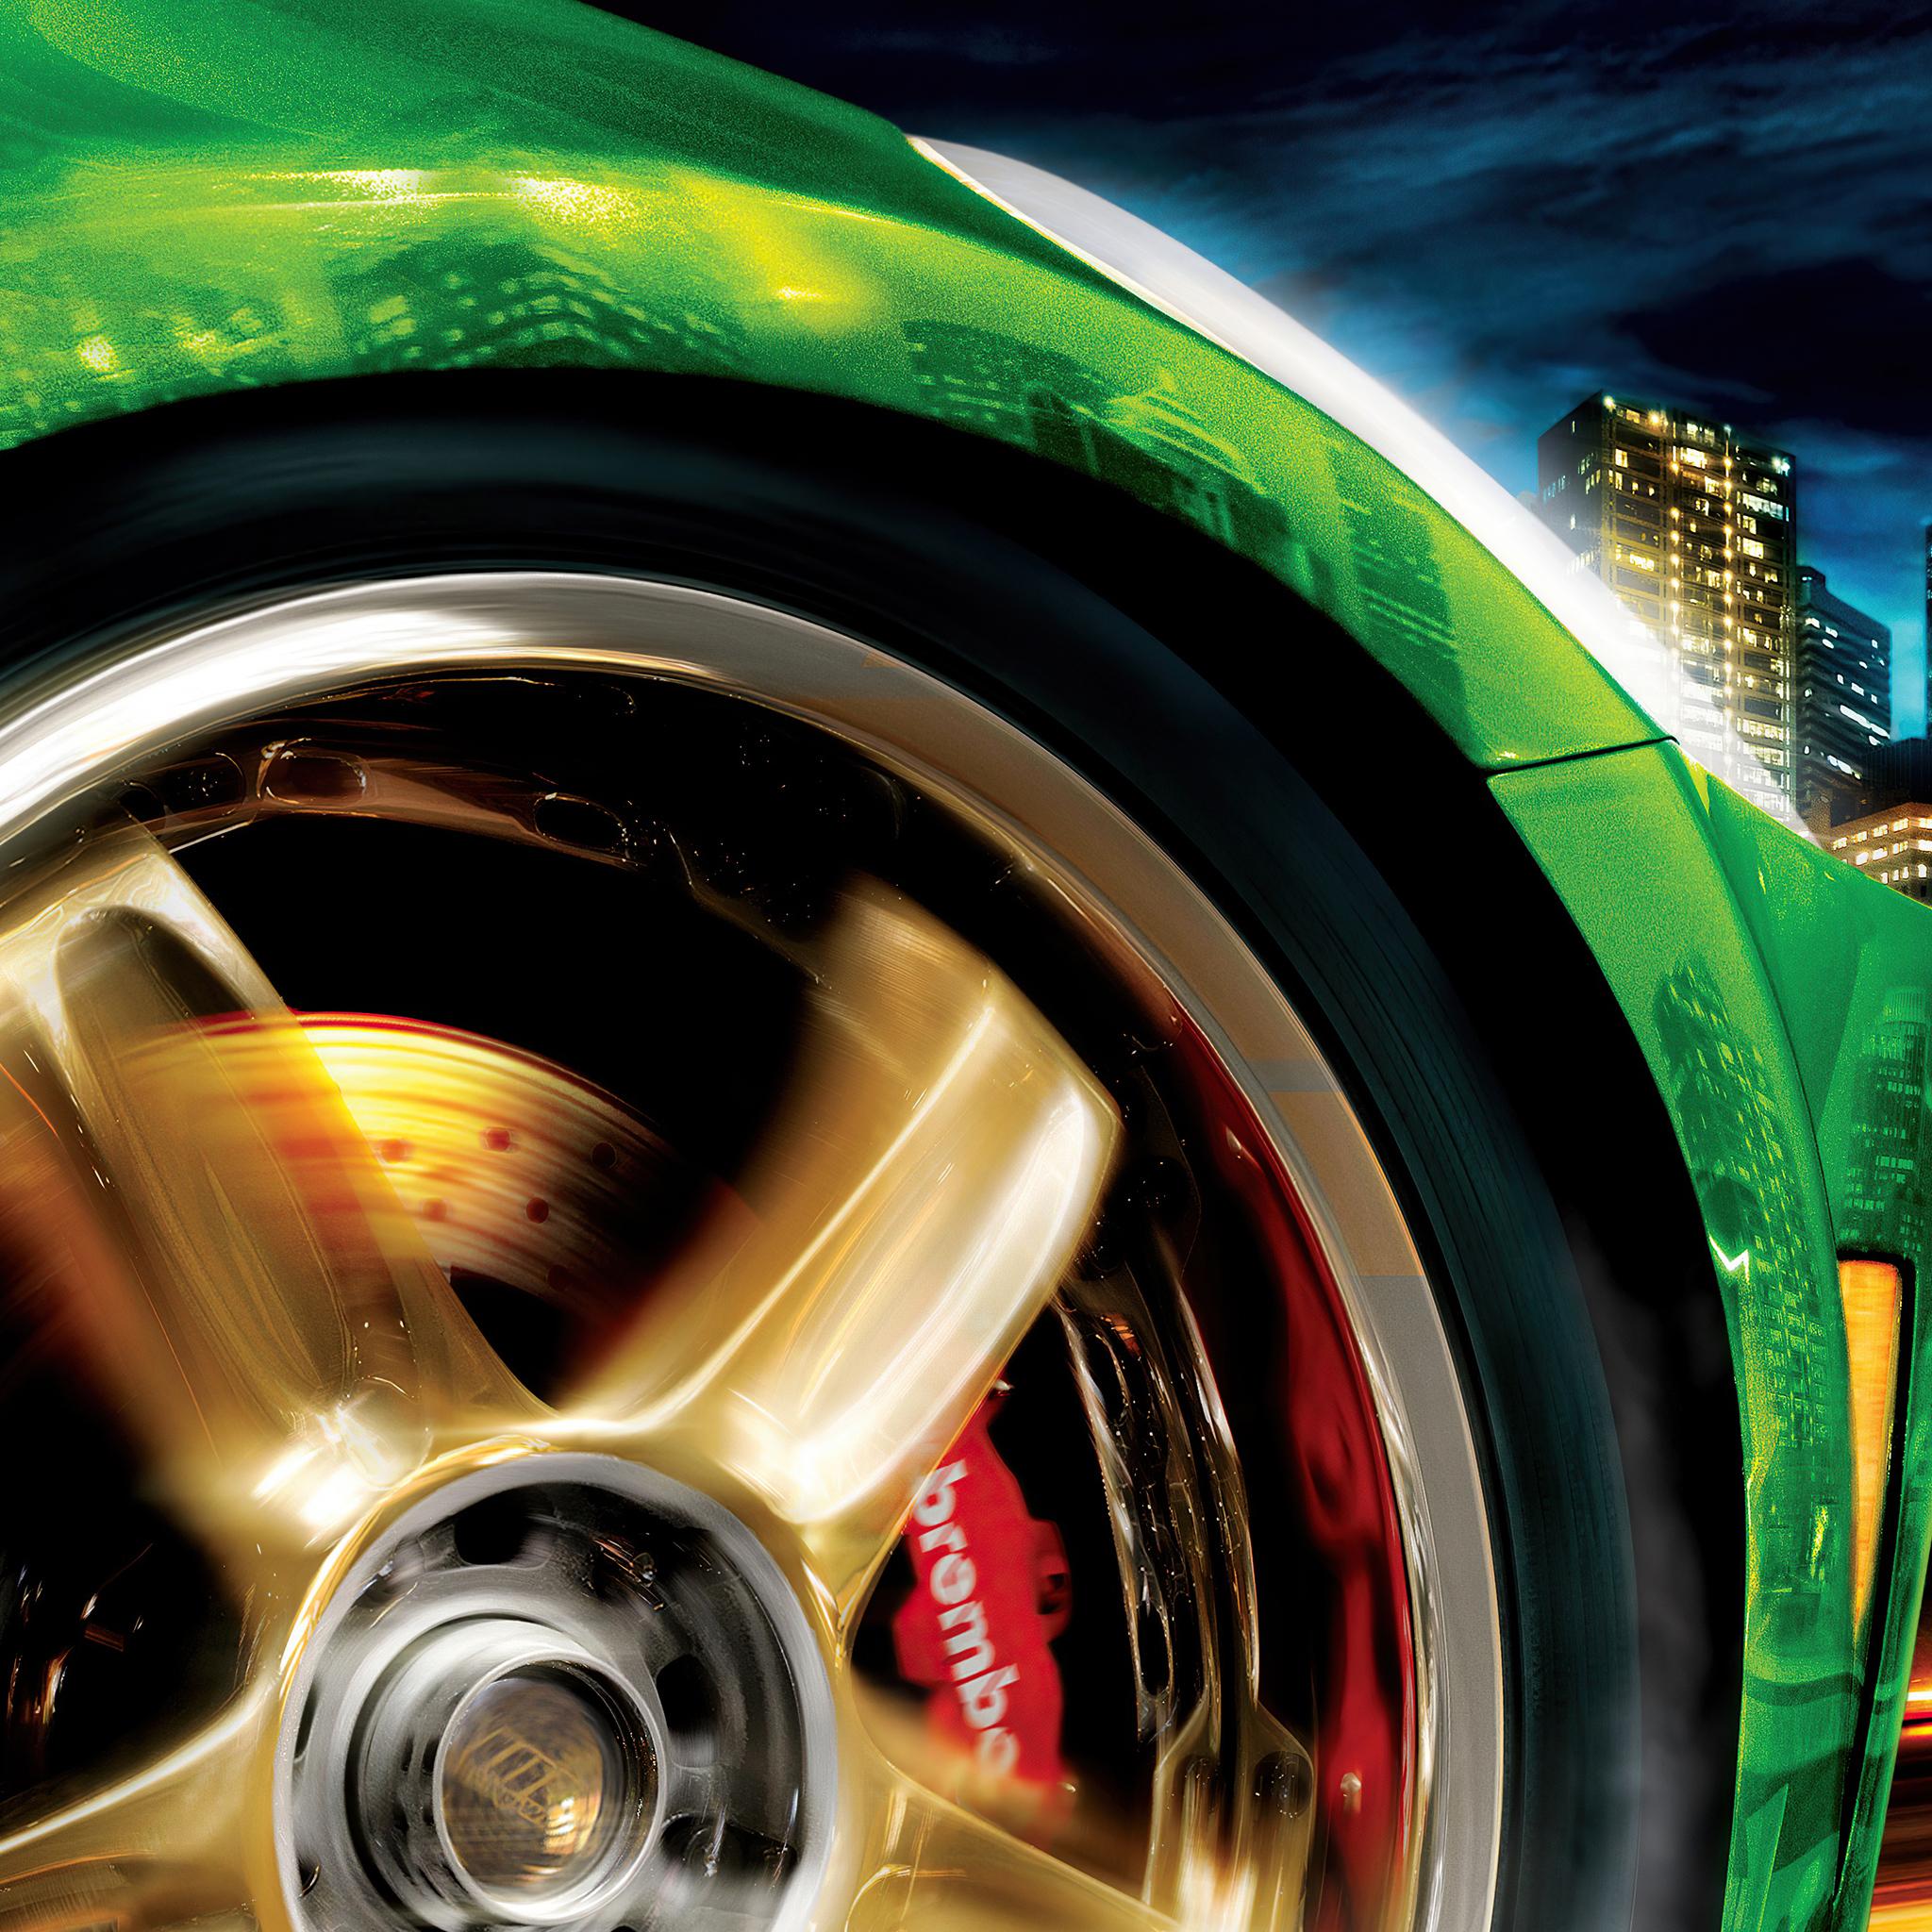 2048x2048 Need For Speed Underground 2 Key Art 5k Ipad Air Hd 4k